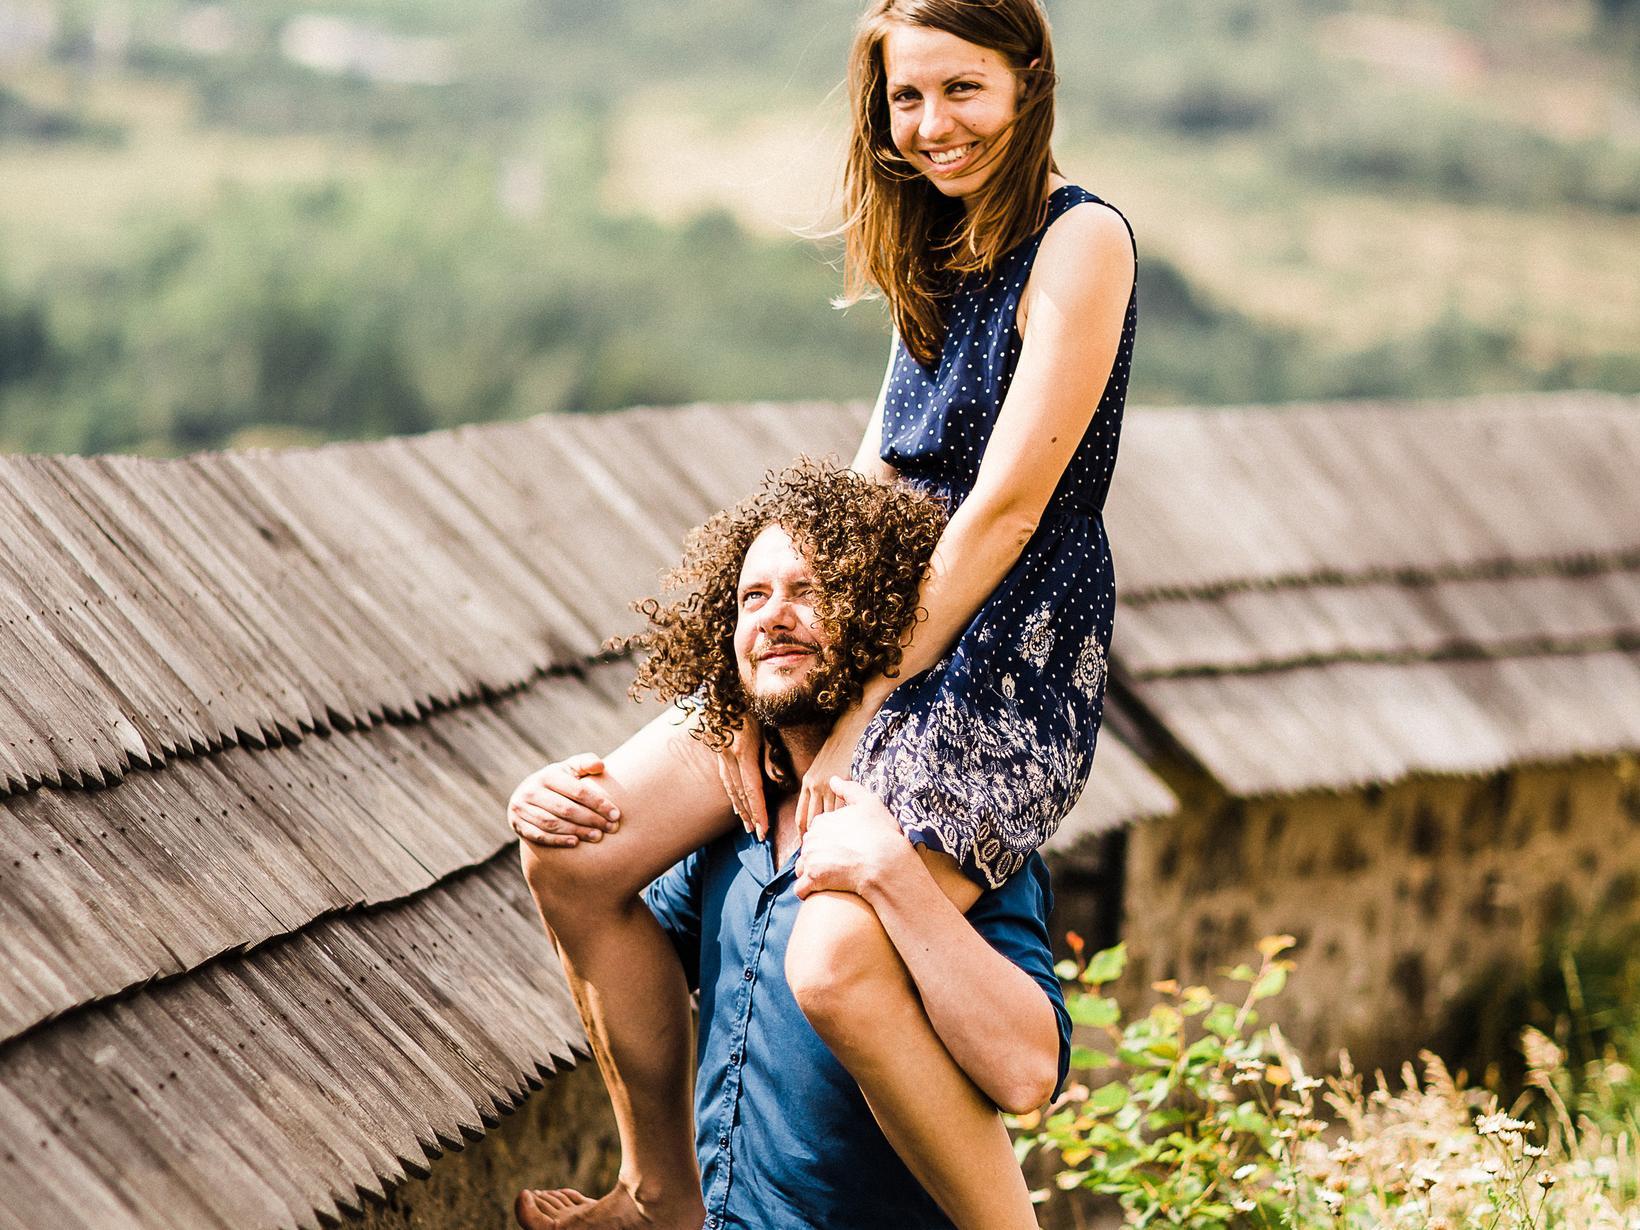 Simona & Jaume from Barcelona, Spain